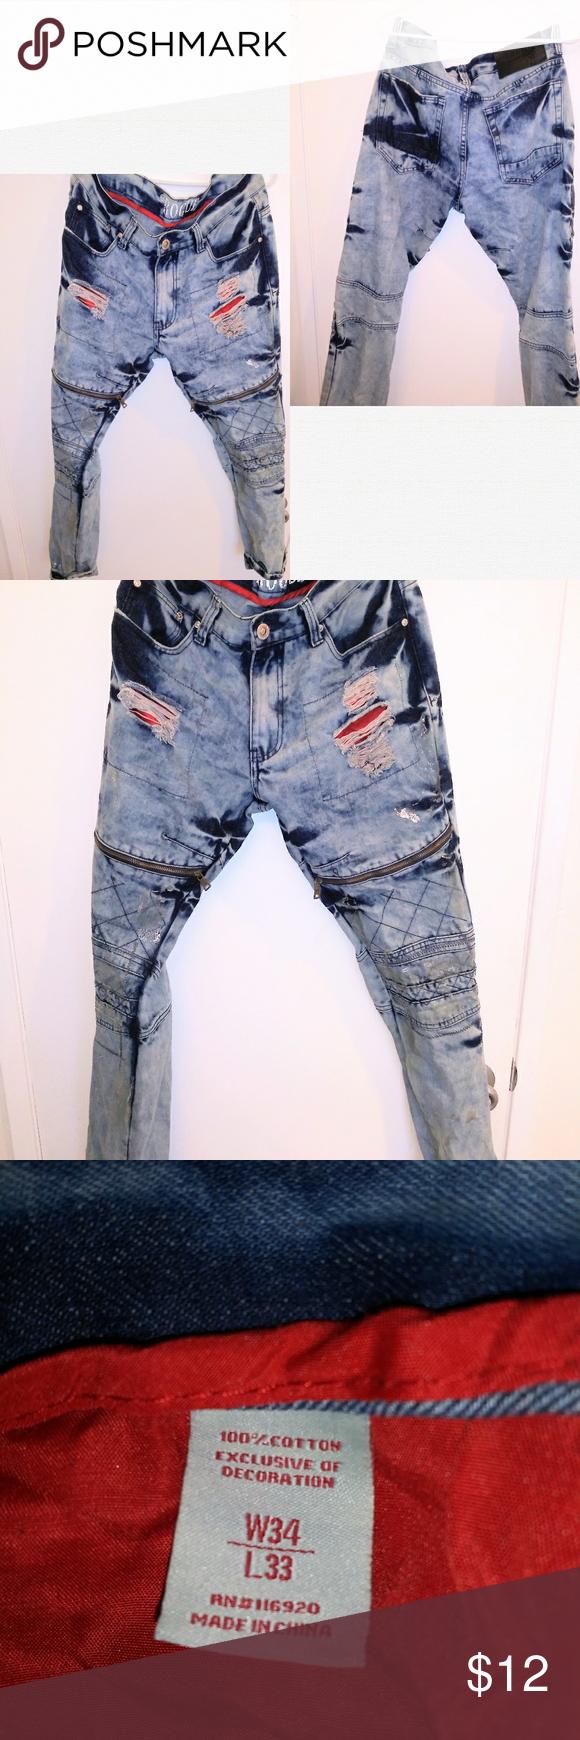 Rogue Blue Denim Distressed Jeans 34 33 Mens Pants Rogue Blue Denim Distressed Skinny Jeans 34 33 Men Distressed Skinny Jeans Distressed Jeans Skinny Jeans Men